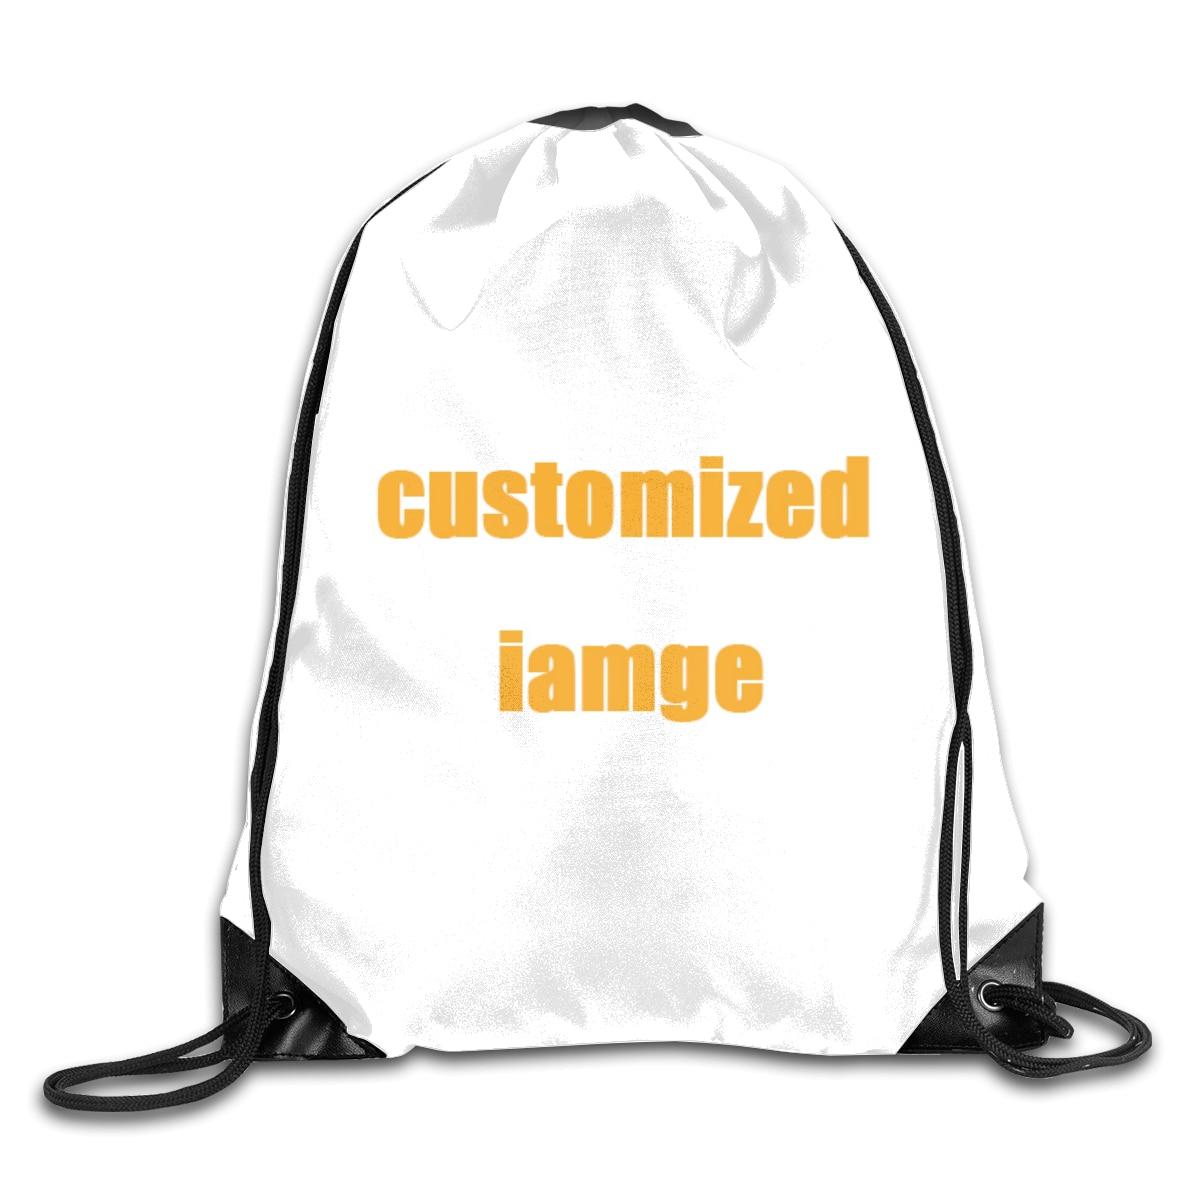 NOISYDESIGNS Customized Backpack School Girls Boys Small Drawstring Bag Custom Print Women's Storage Shoulder Bags Worek Sznurek